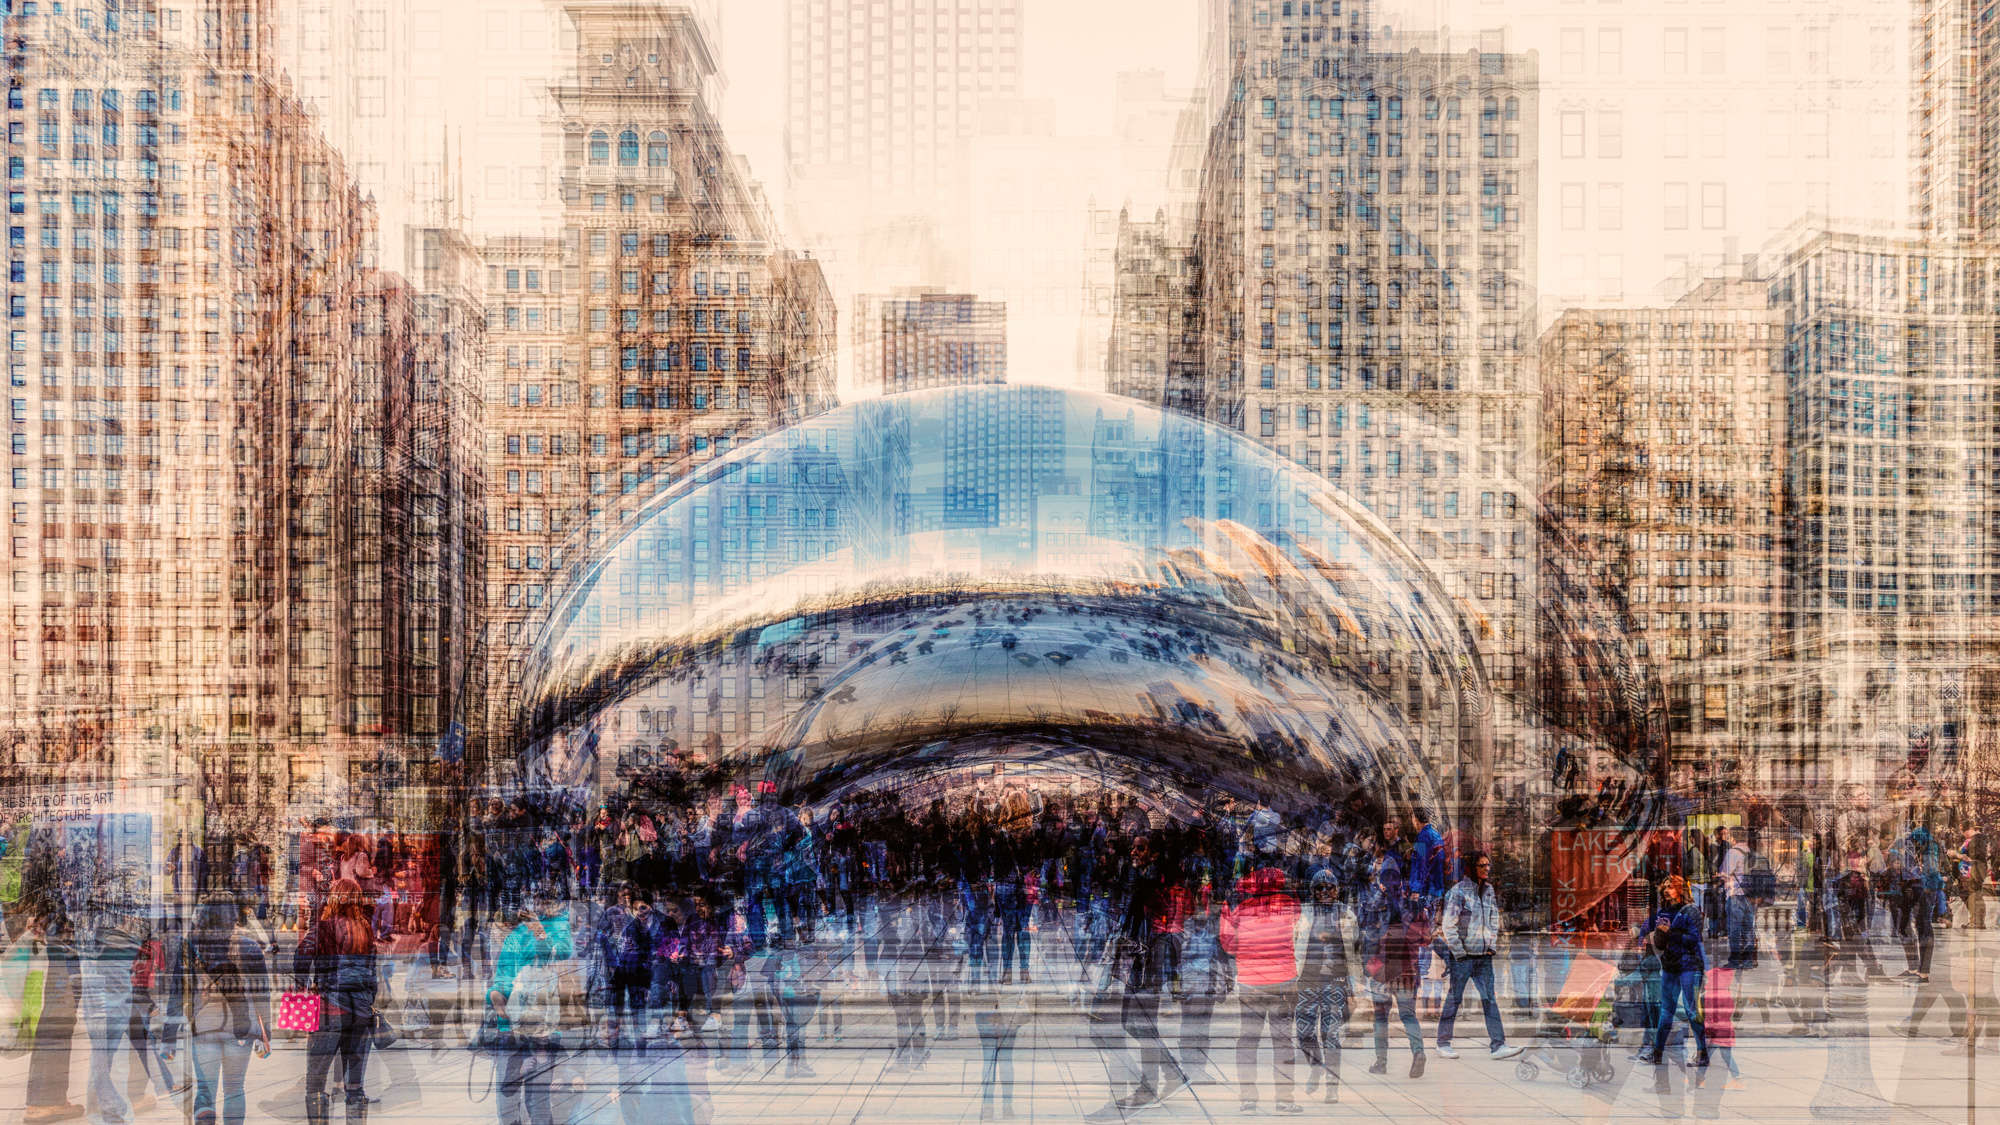 Laurent Dequick - Chicago Cloud Gate